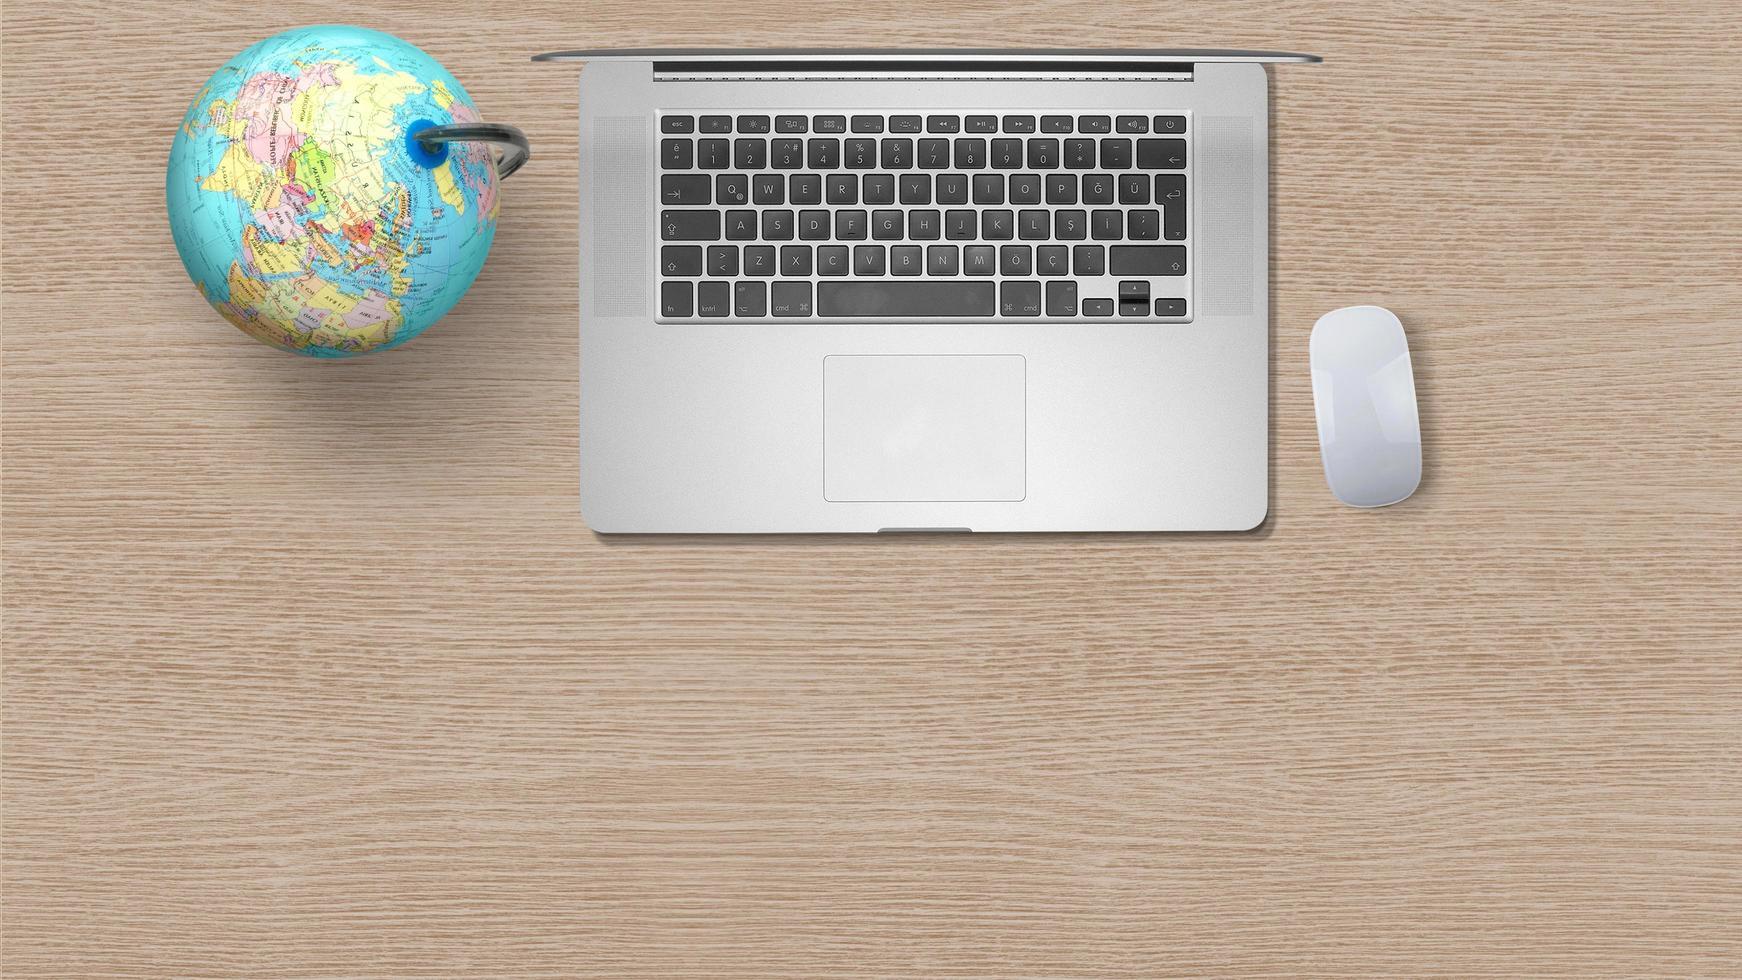 Globo con computadora portátil sobre papel blanco sobre fondo de madera foto